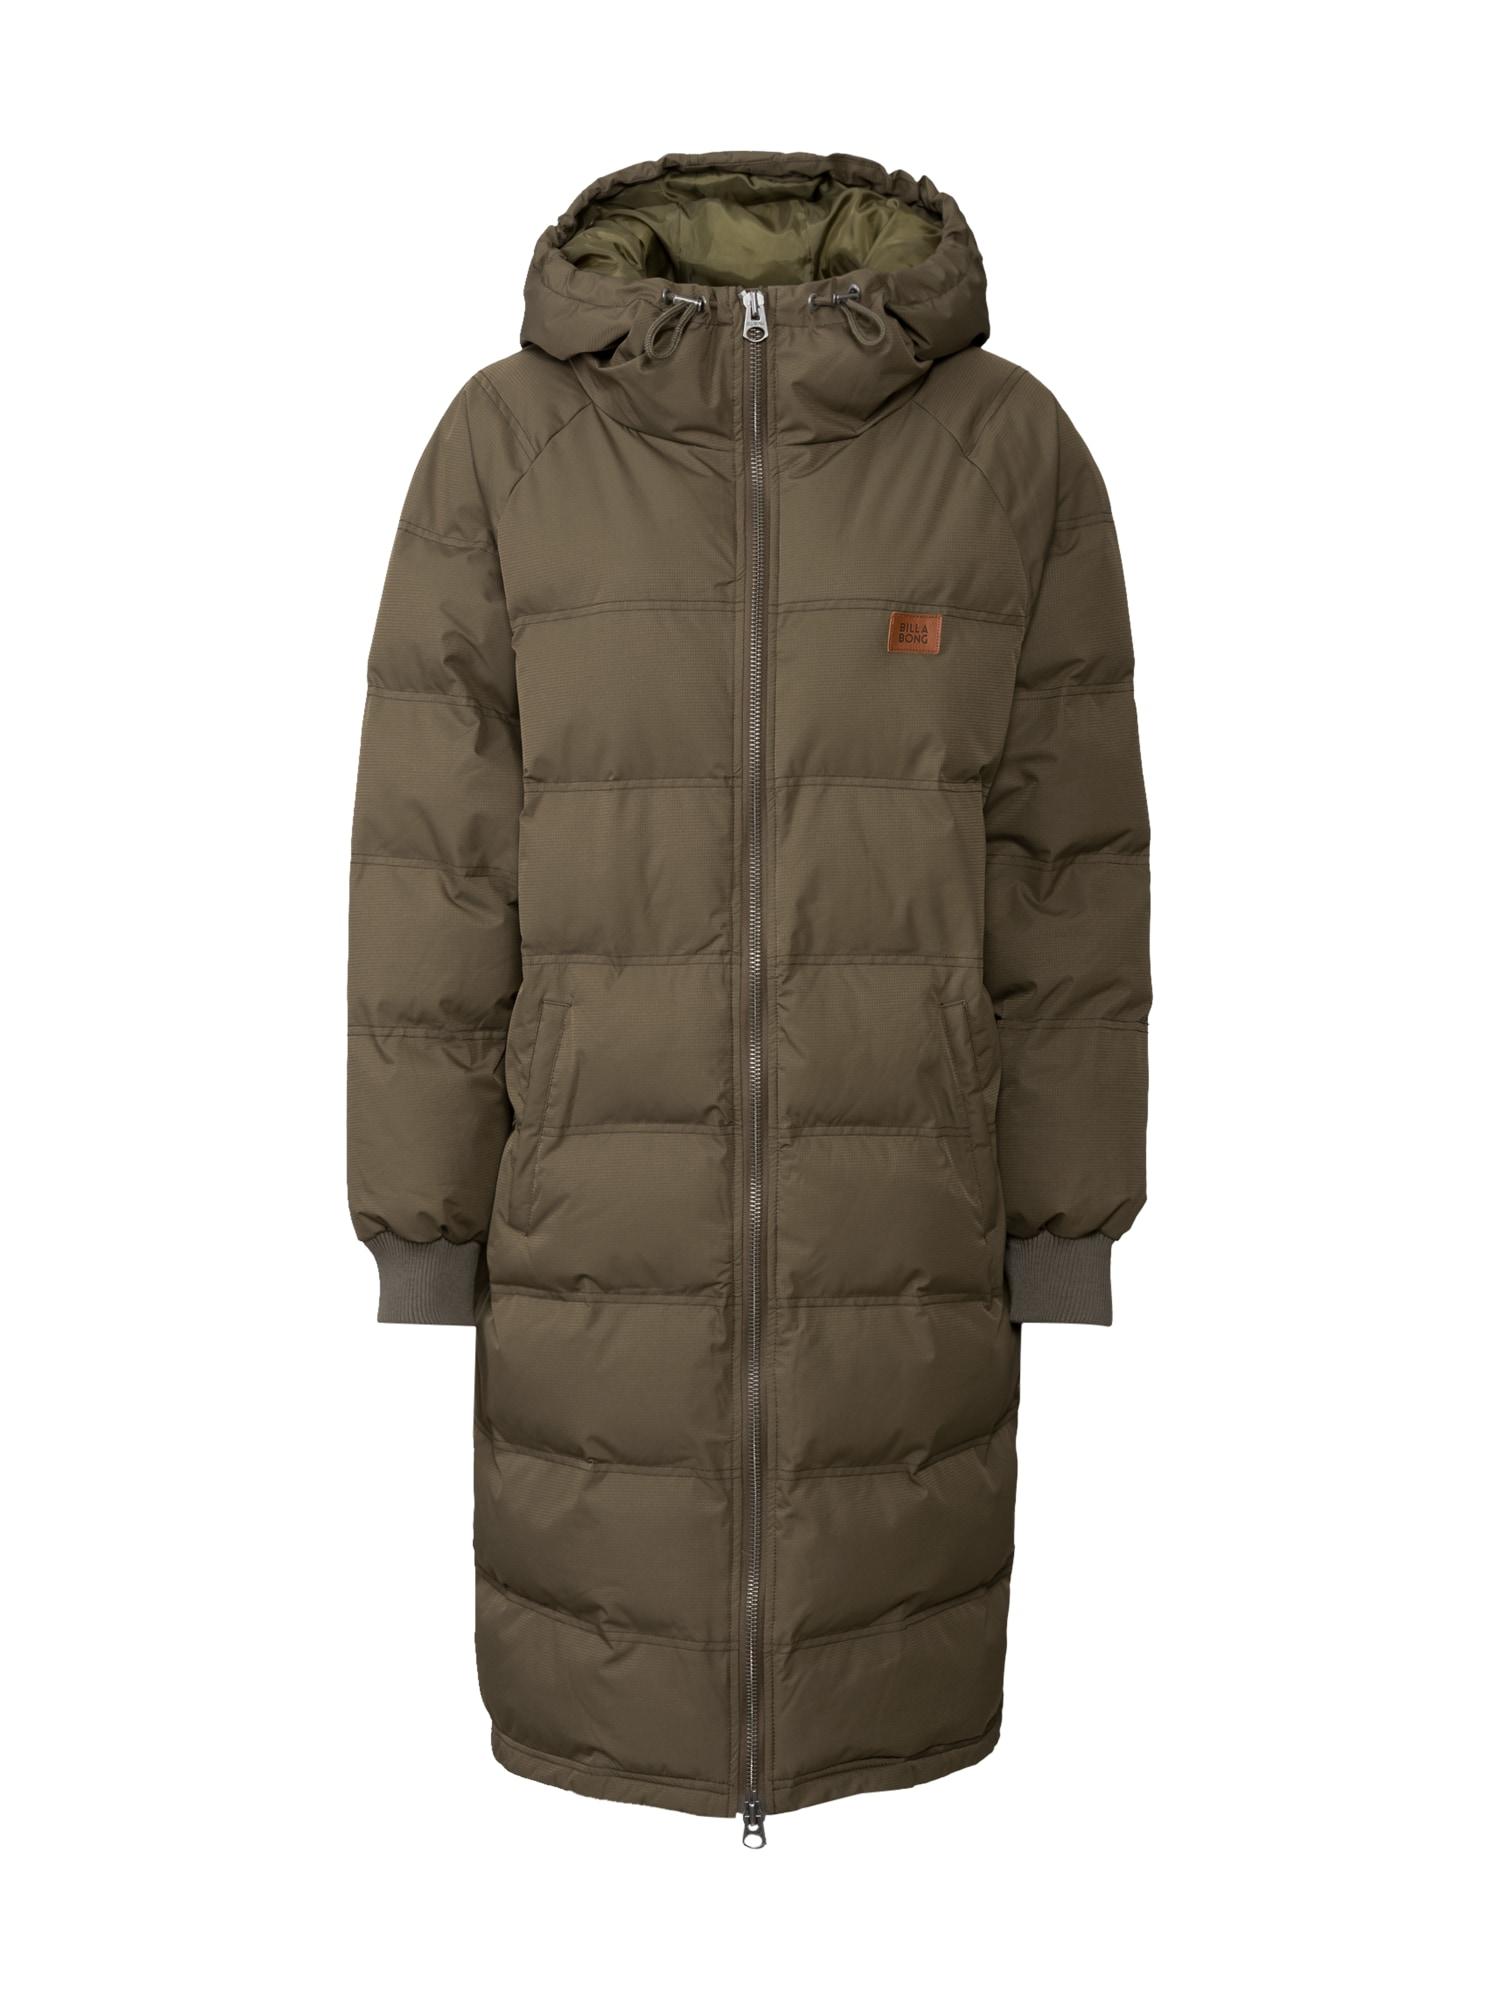 BILLABONG Žieminis paltas 'Northern' alyvuogių spalva